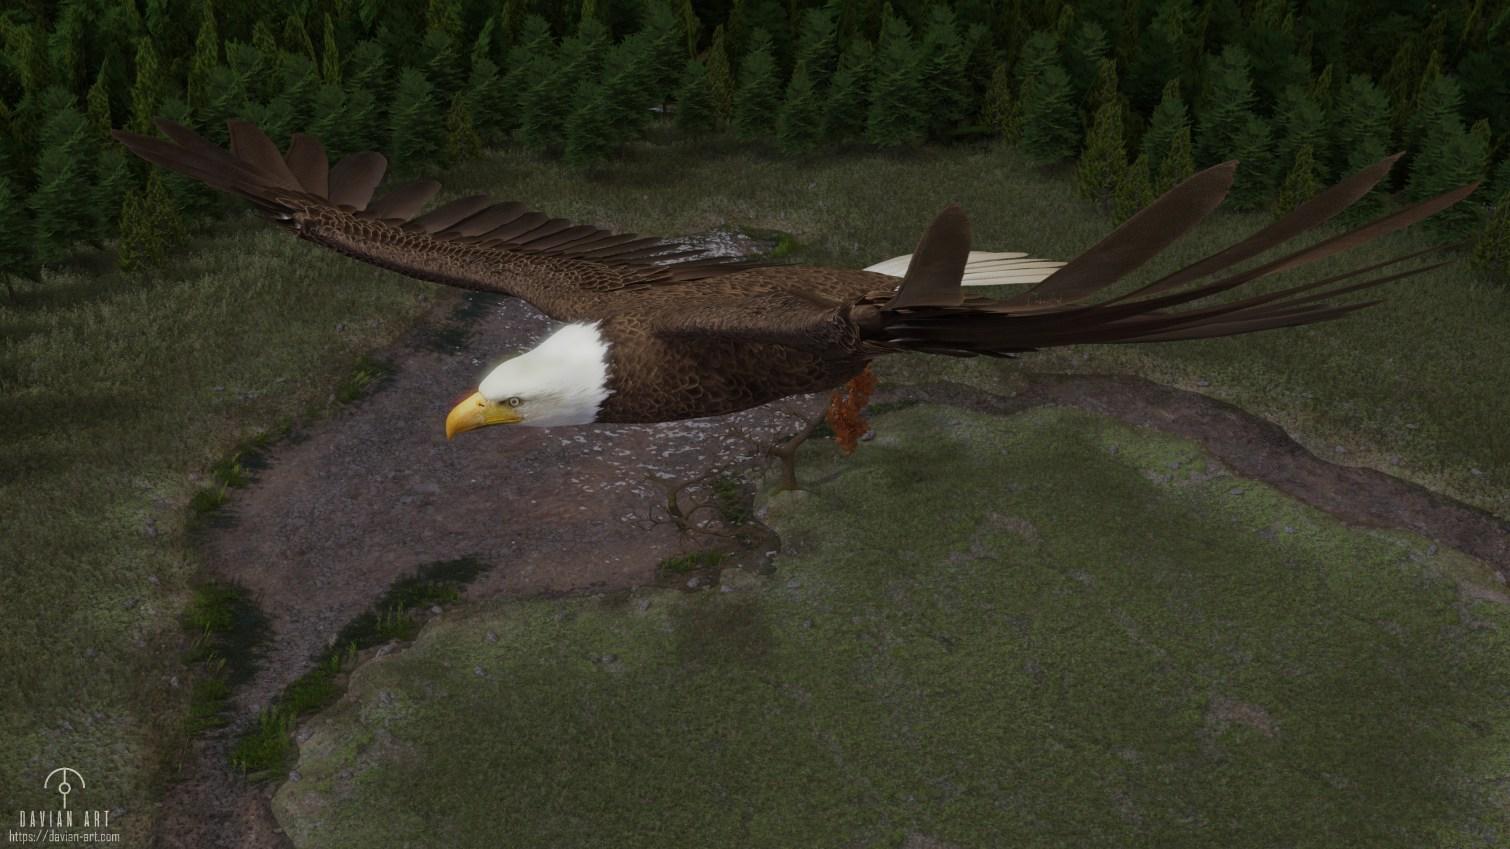 EagleByDavianArt